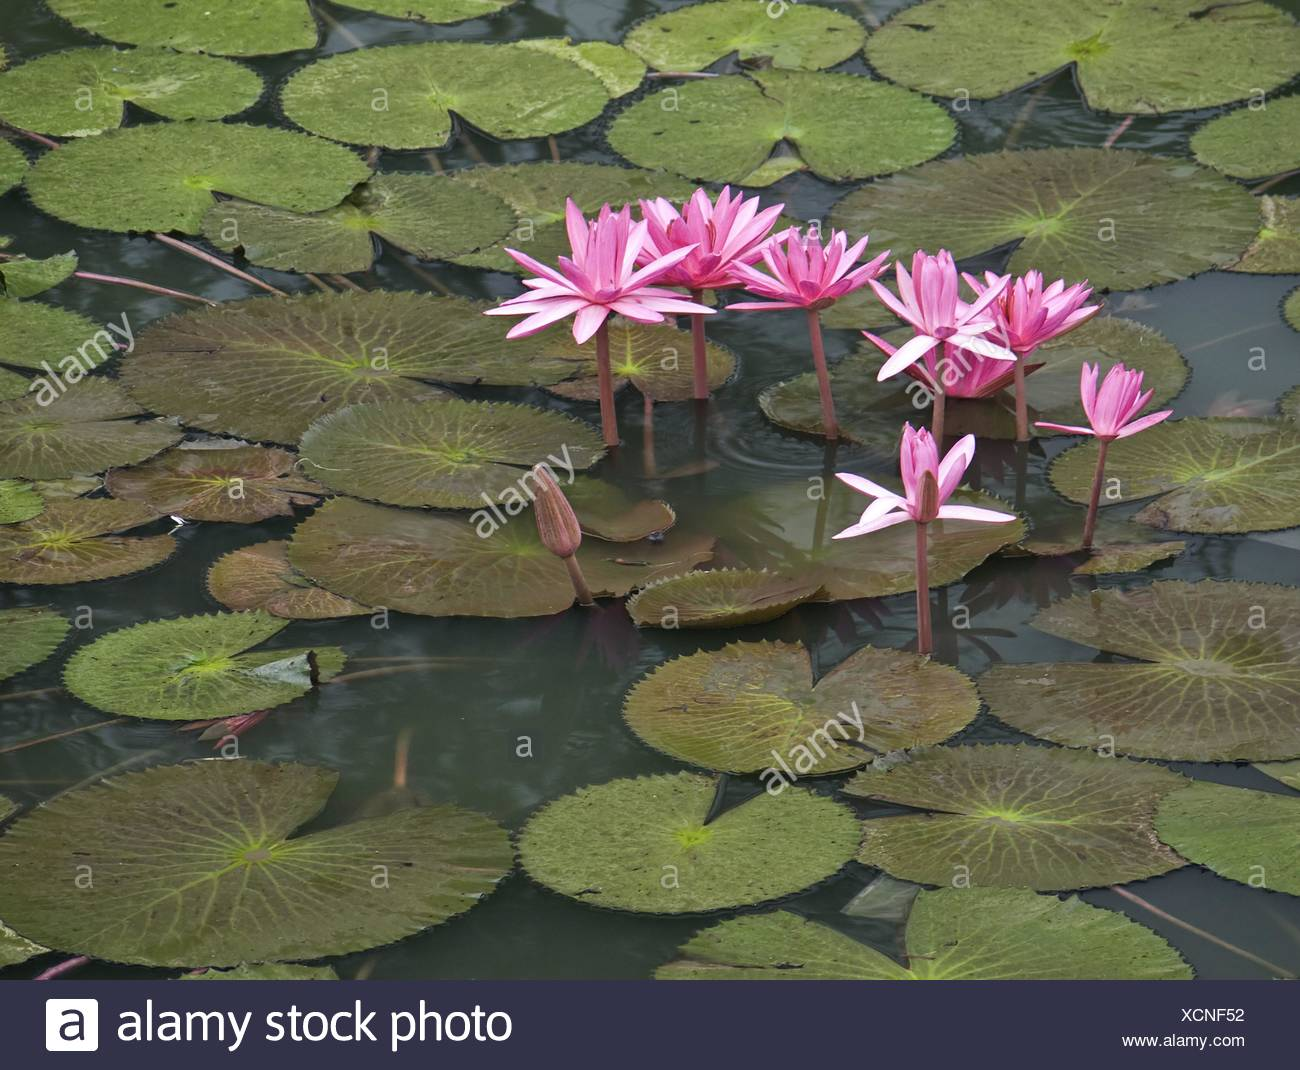 Asia Lily Viet Nam Vietnam Lotus Aquatic Plant Lotus Flower